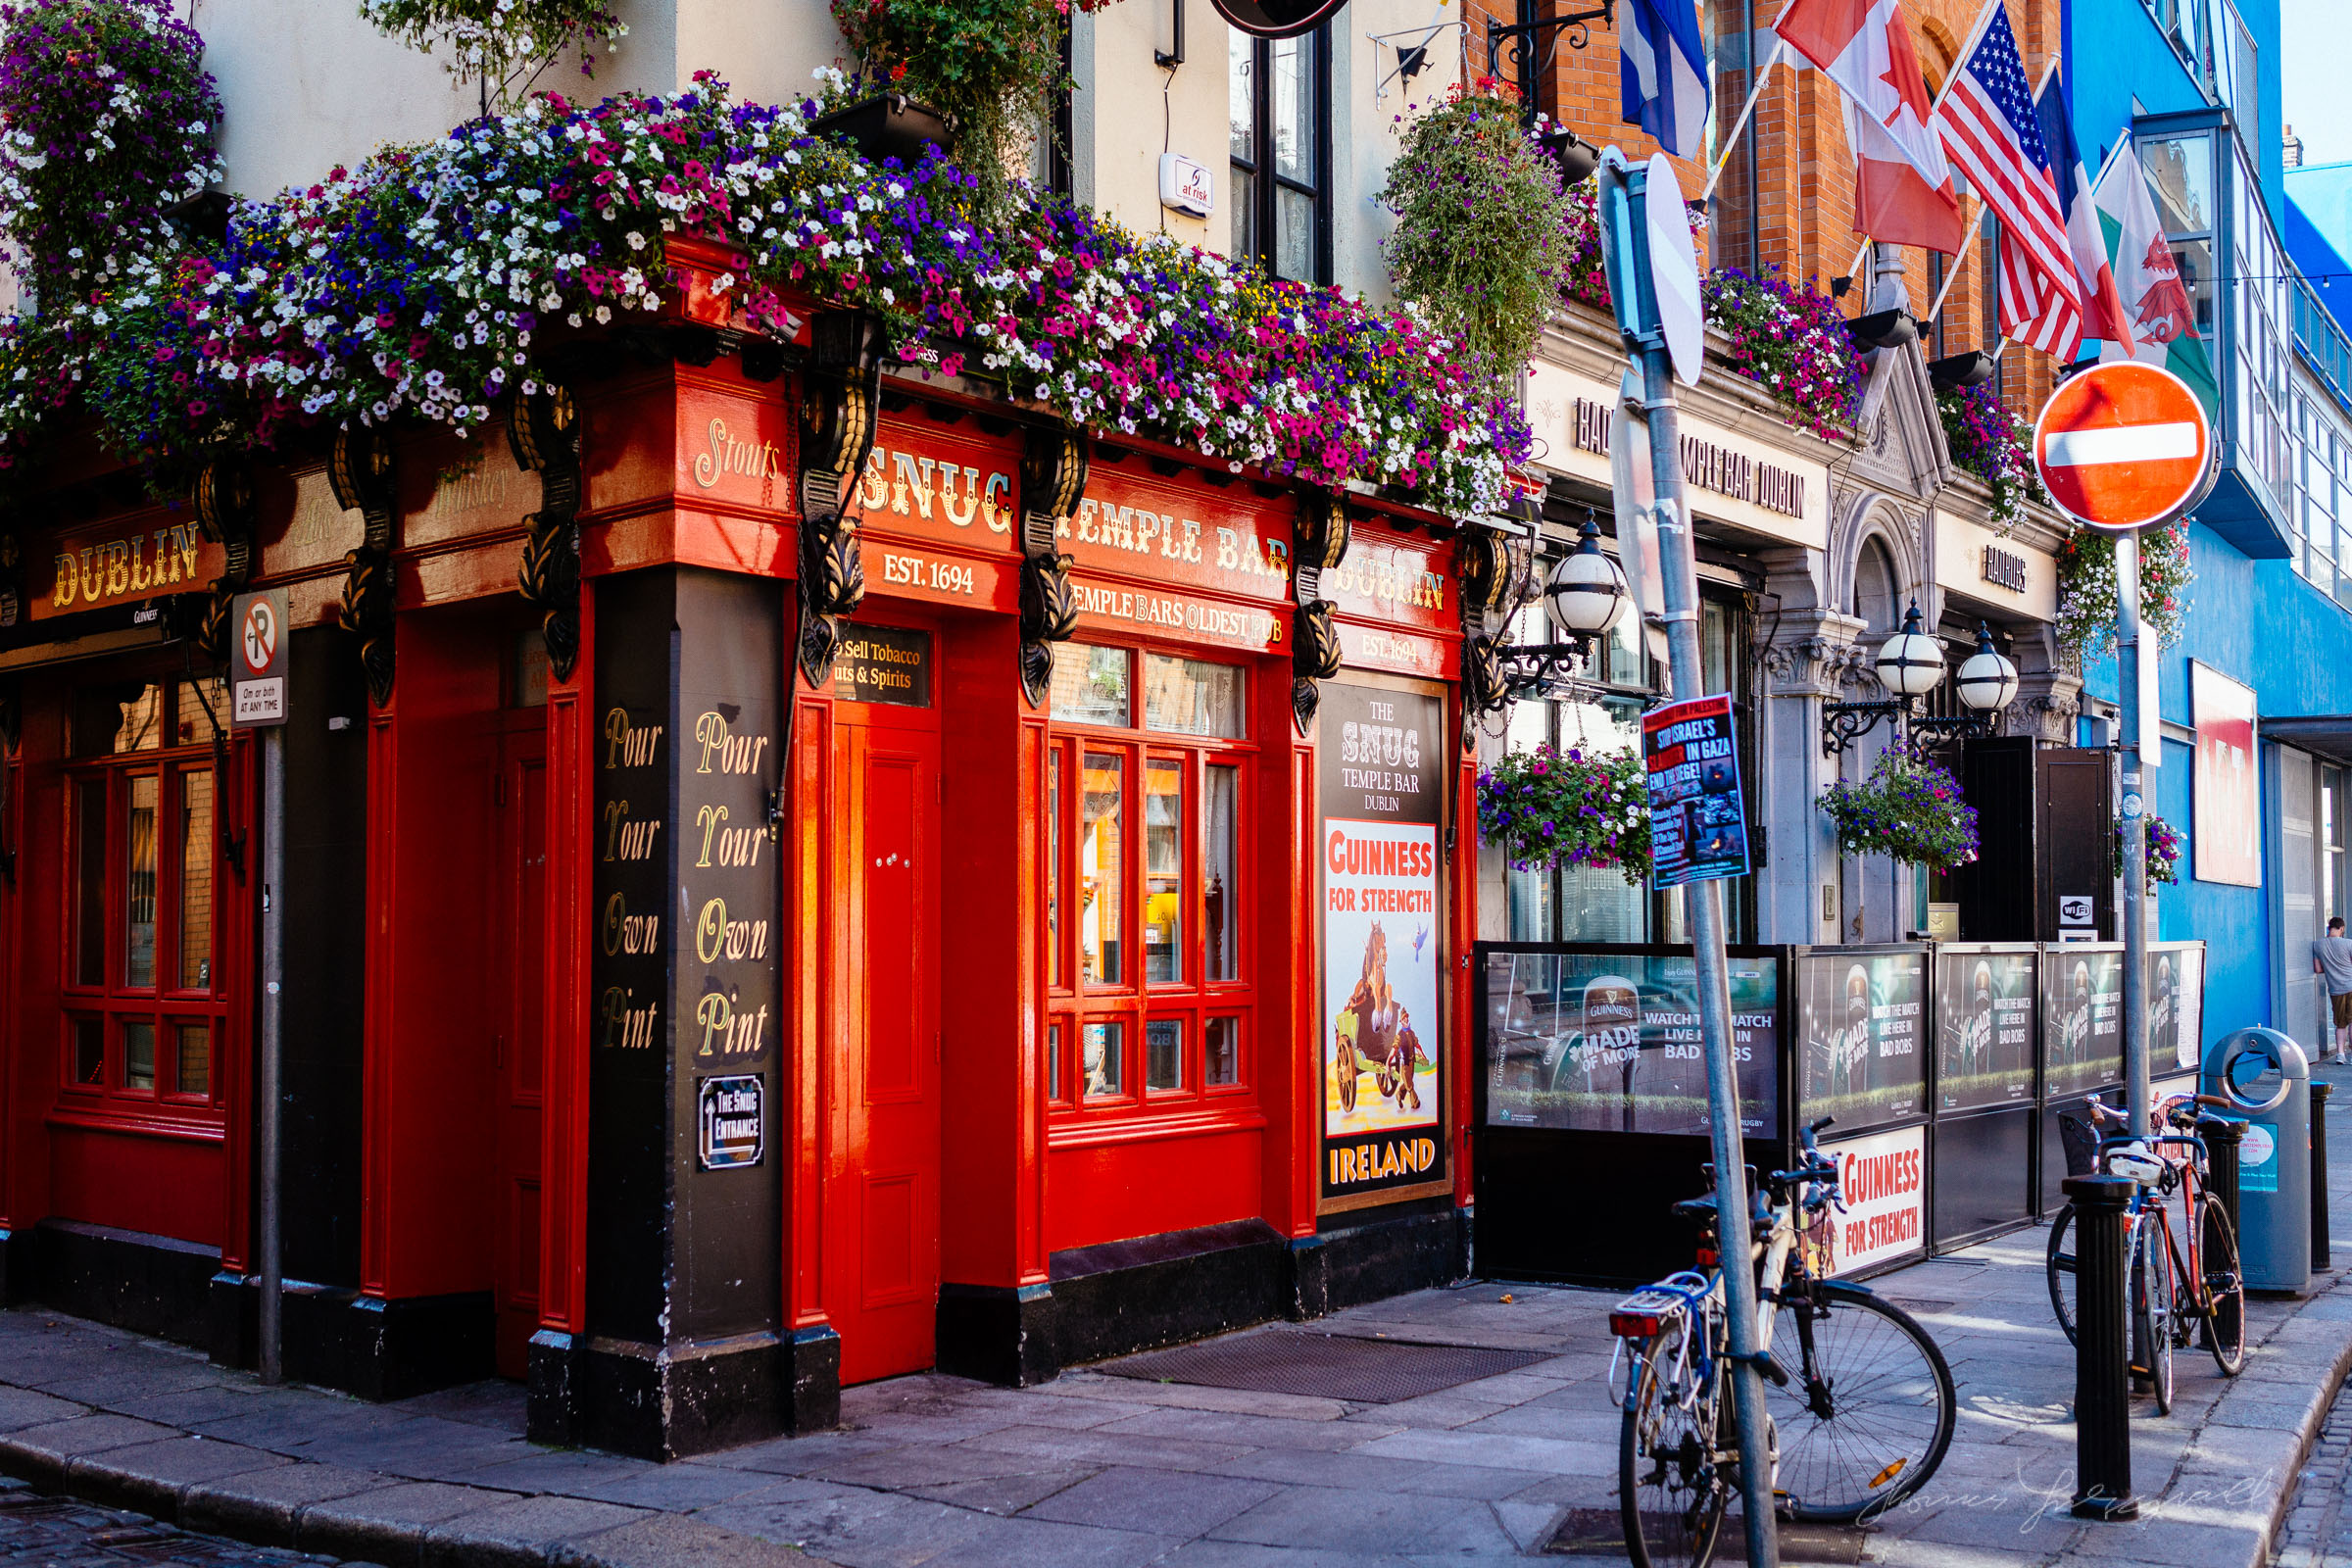 Flowers outside a Dublin Pub